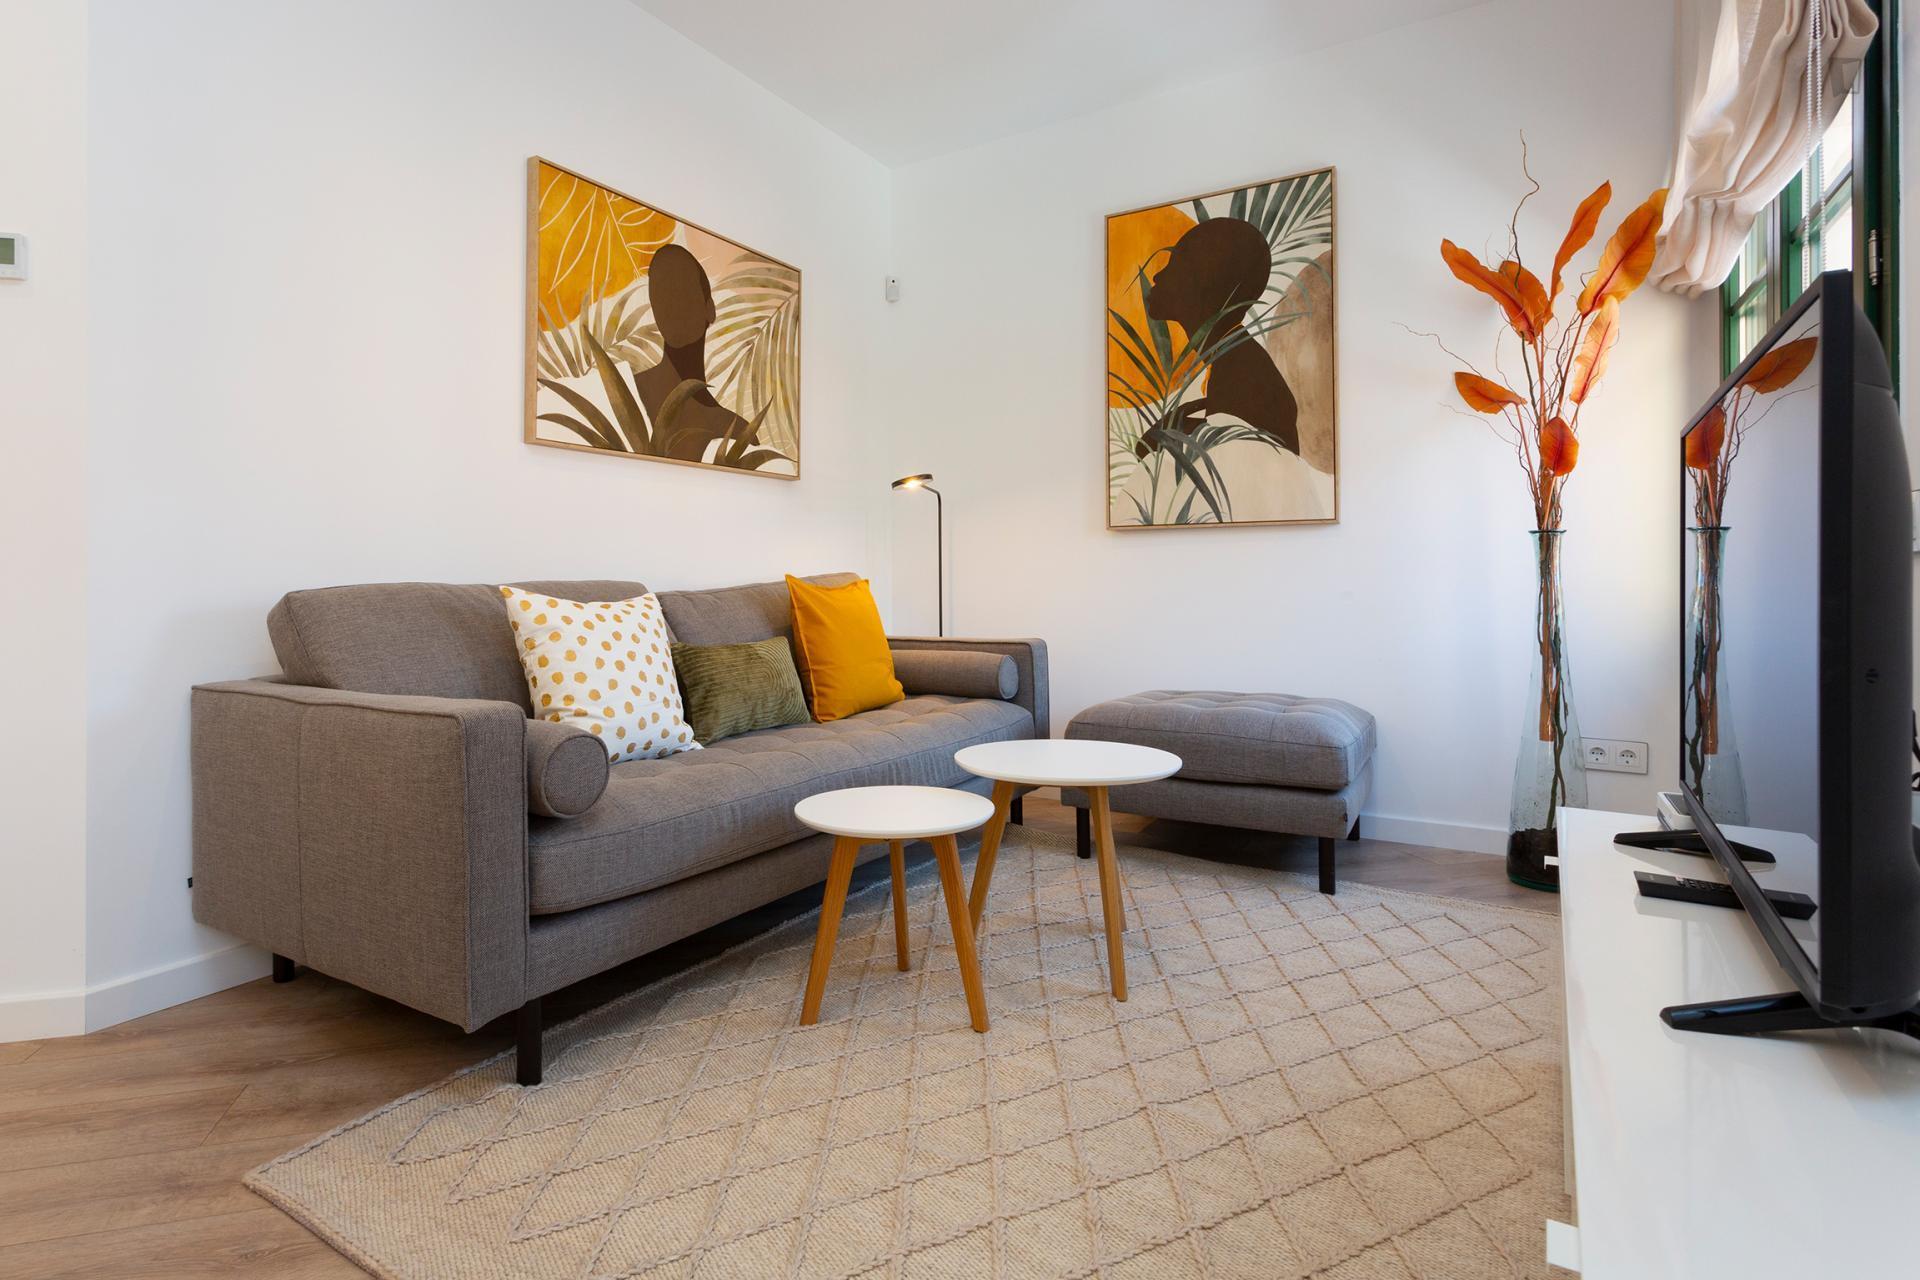 Portugalete 2 - Moderno piso en Barcelona